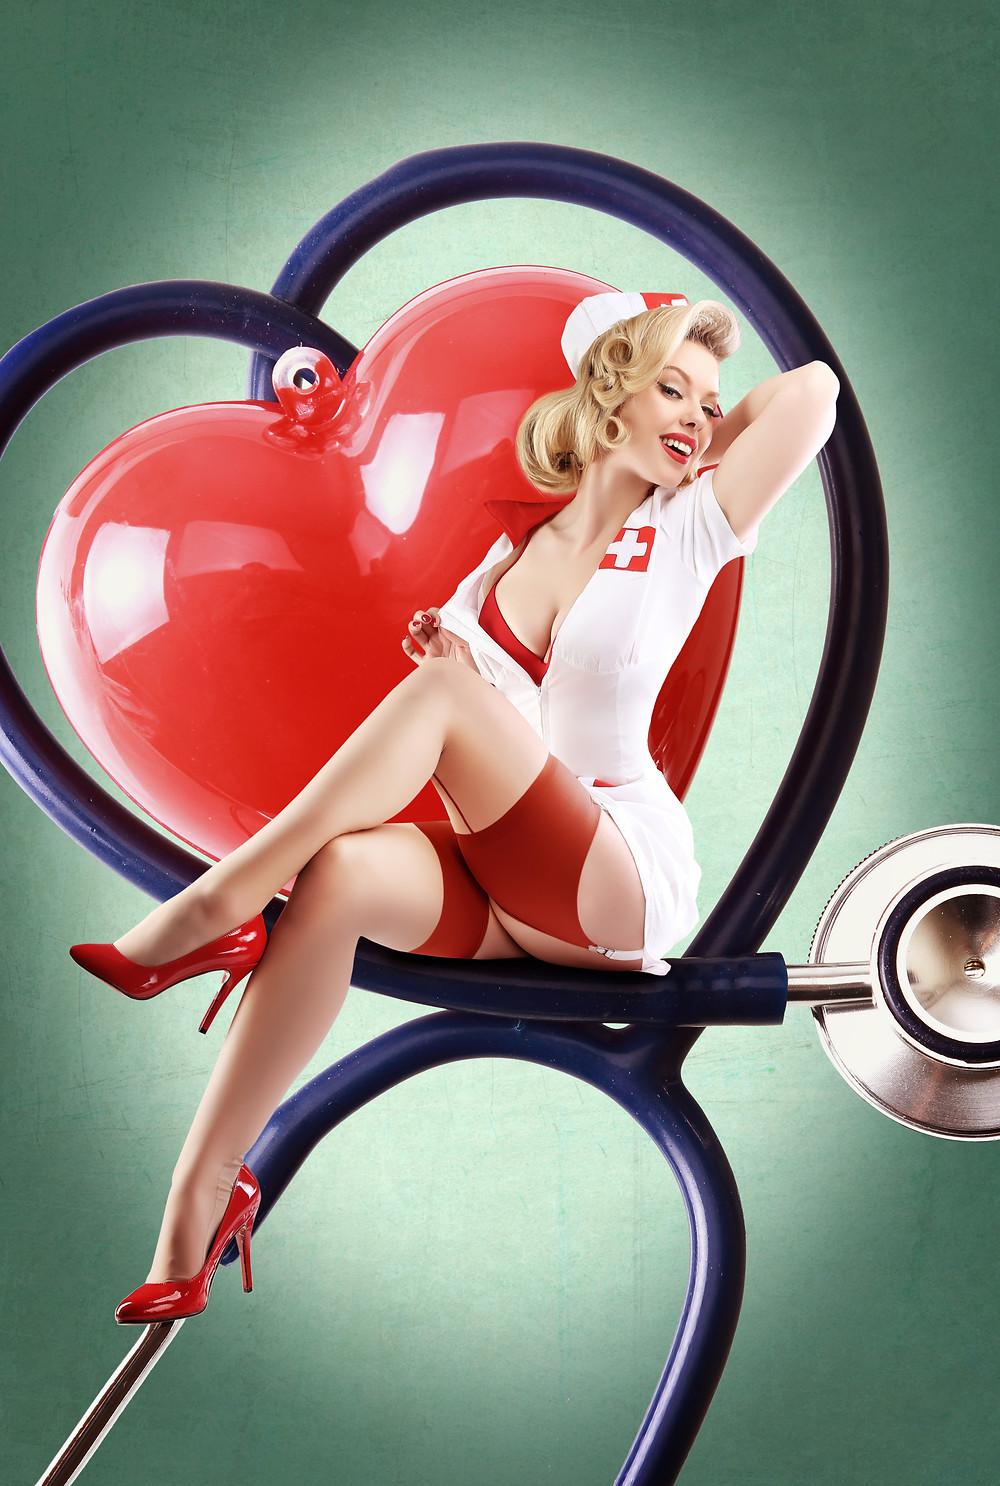 Nurse Pin Up Ideas Heather Valentine Model by Dollhouse Photography